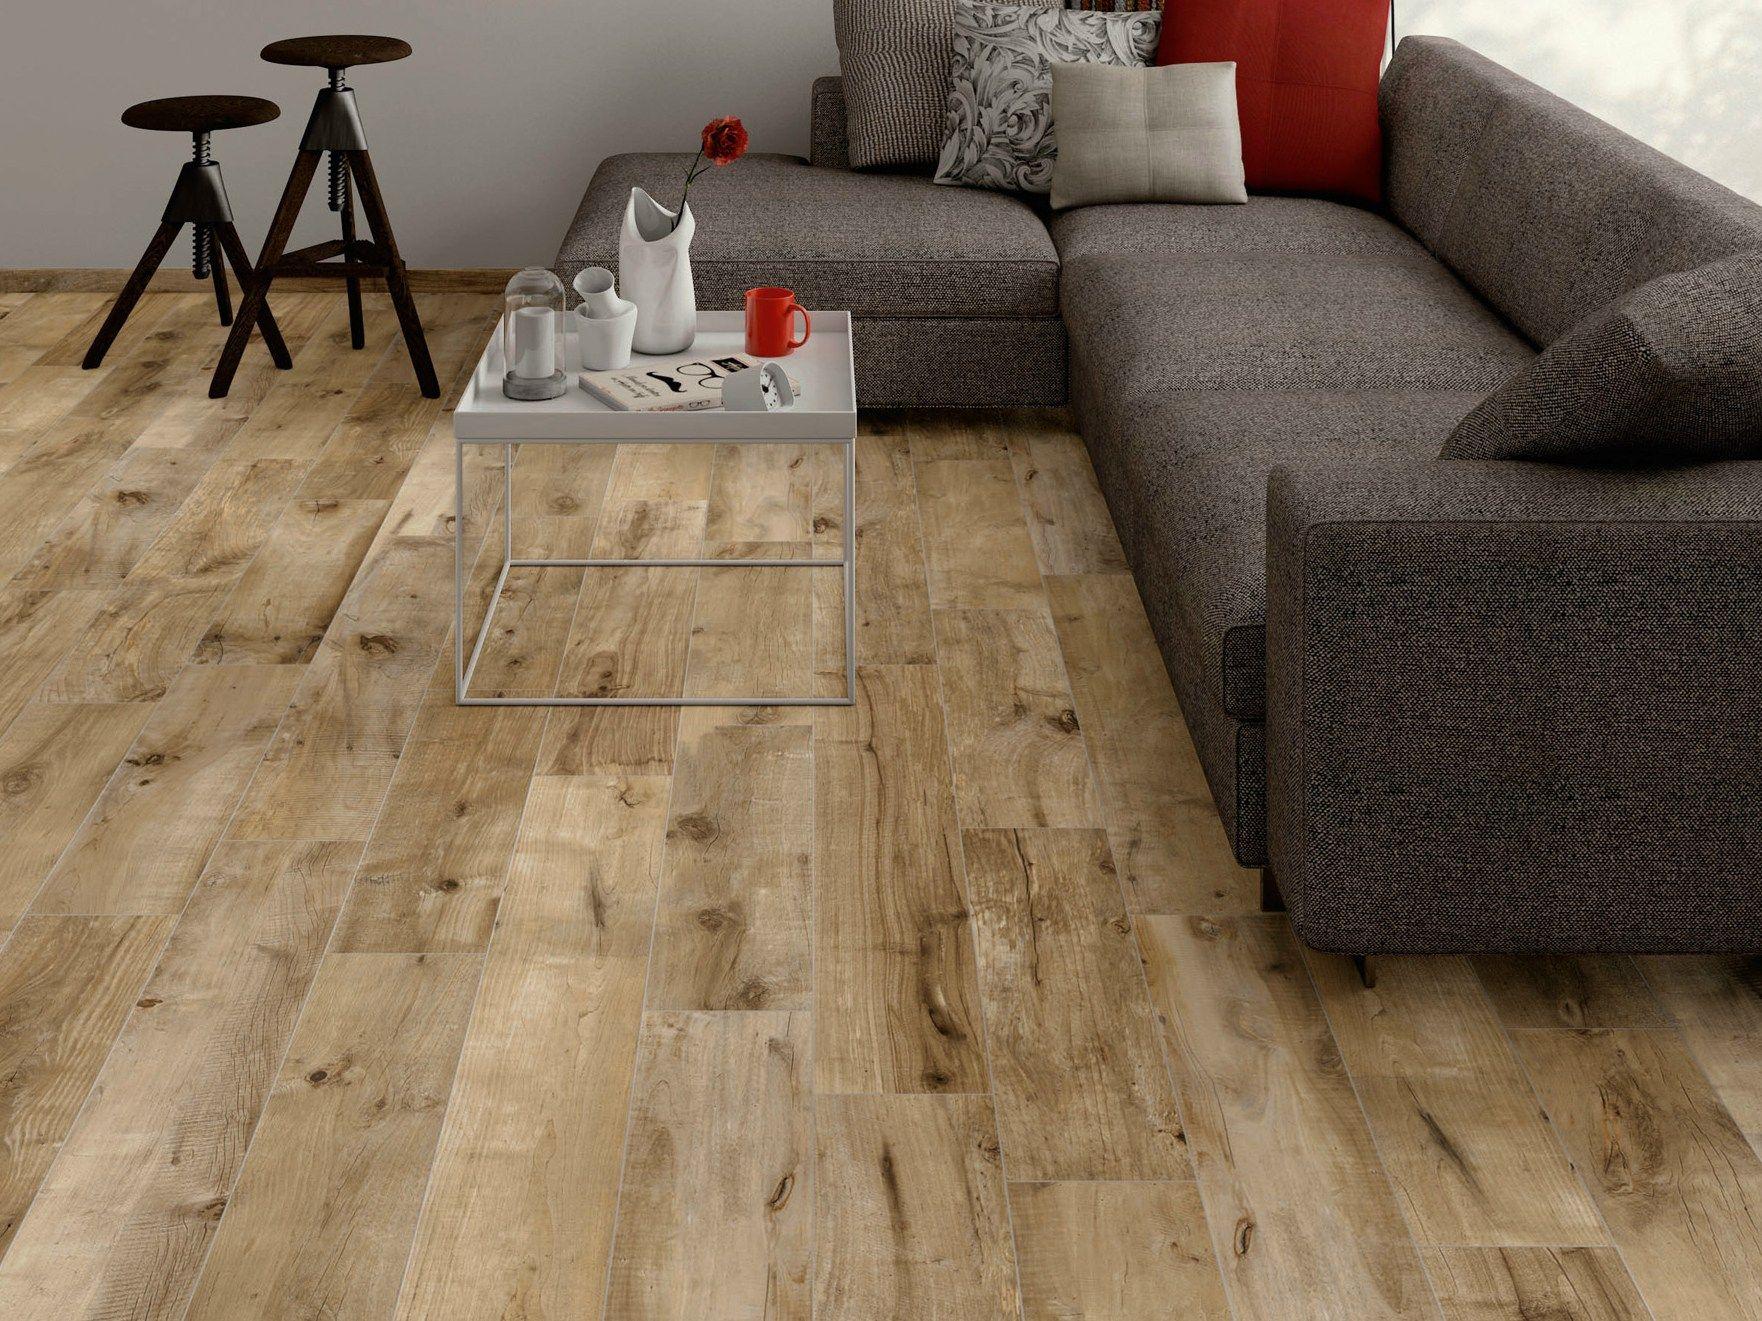 Flaviker dakota naturale google zoeken for the home pinterest explore wood ceramic tiles wood look tile and more dailygadgetfo Gallery